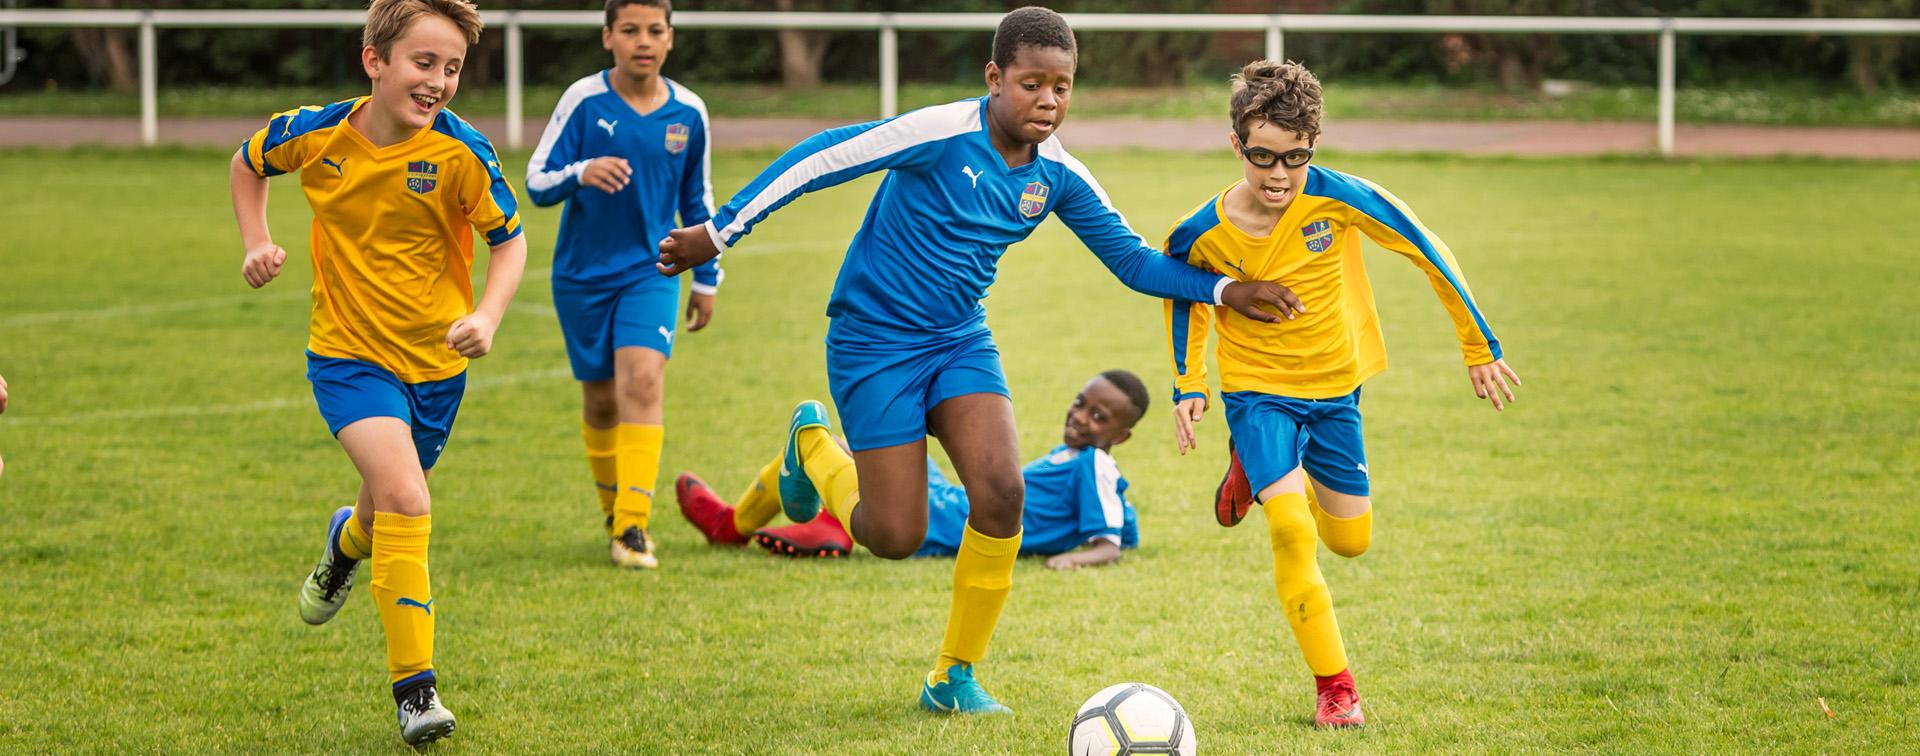 BOLLE Sports - Kids Protective Eyewear